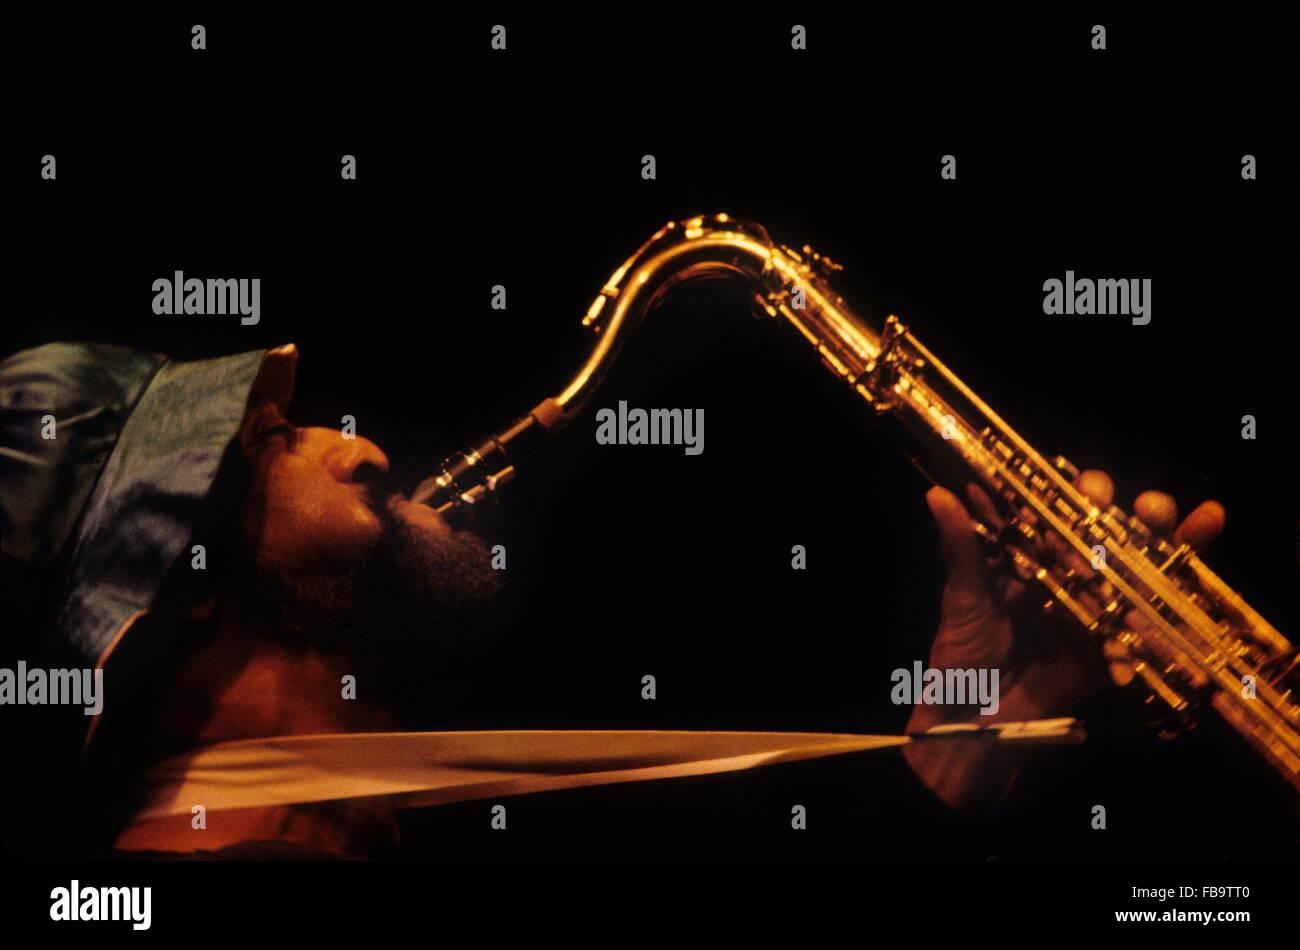 Sonny ROLLINS : one of the greatest Jazz saxophonist.  -  1979  -  France / Ile-de-France (region) / Paris  -  Sonny - Stock Image